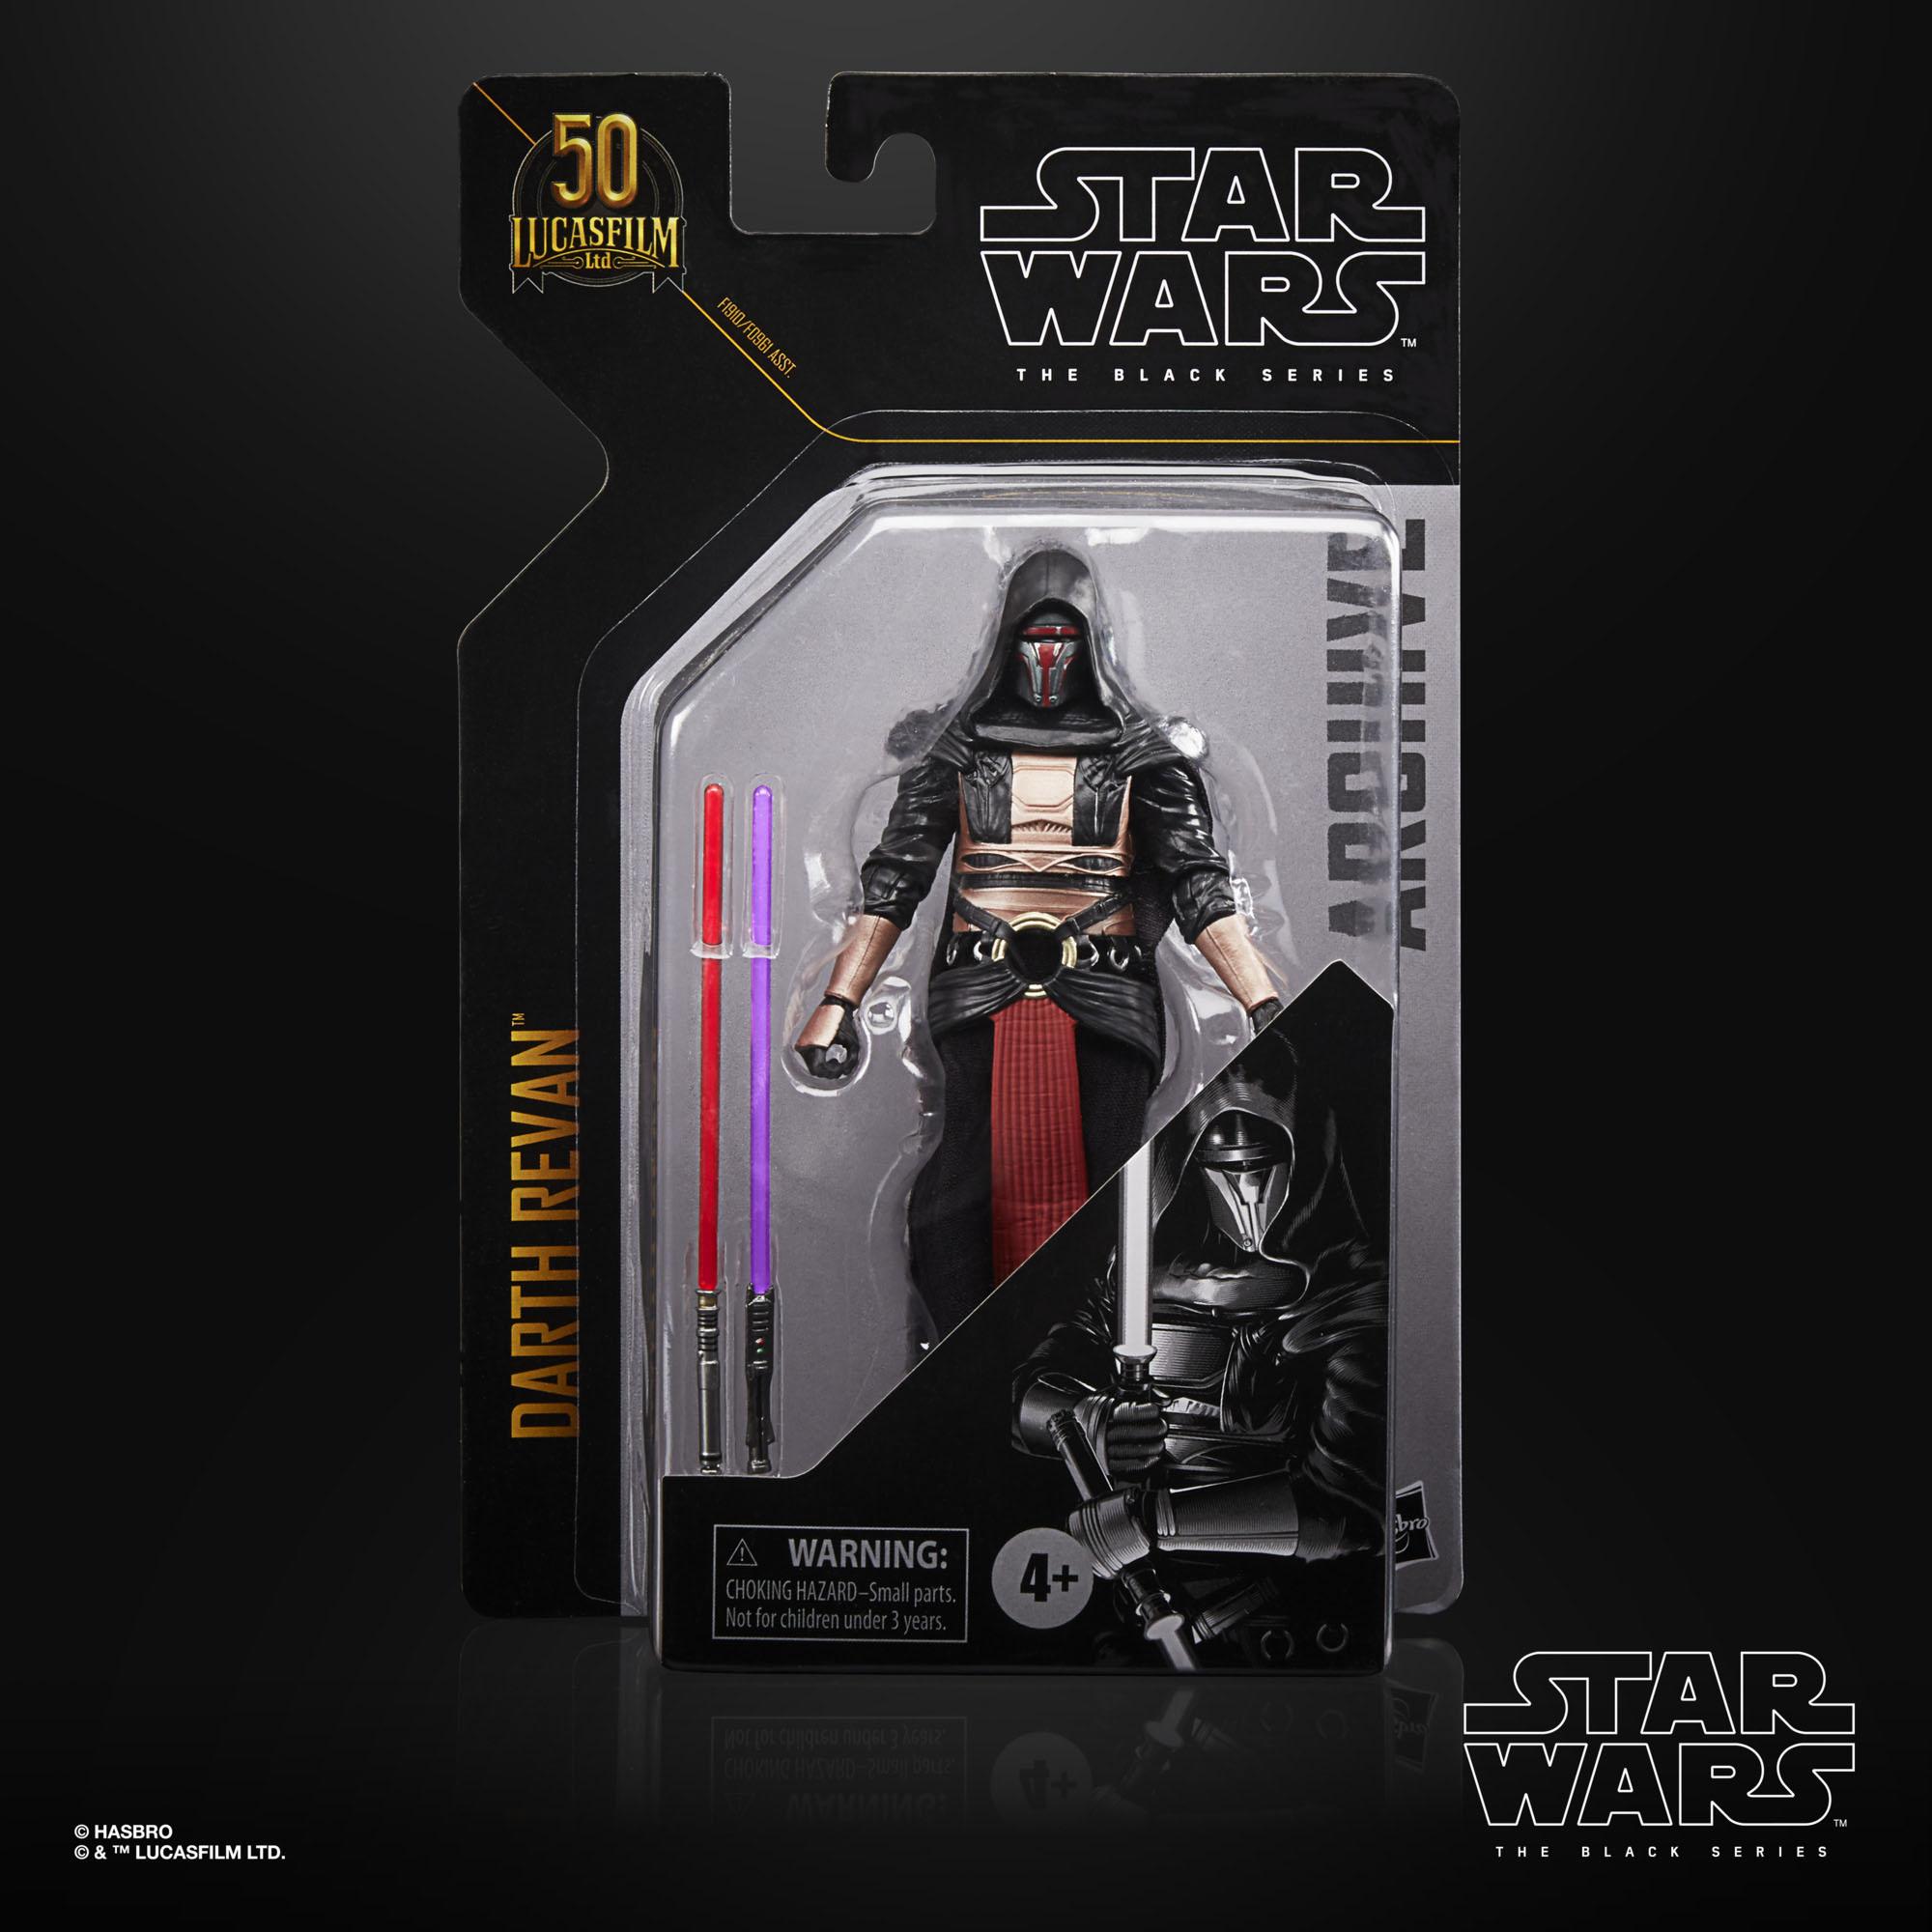 Star Wars The Black Series Archive Darth Revan F19105X0 5010993830992